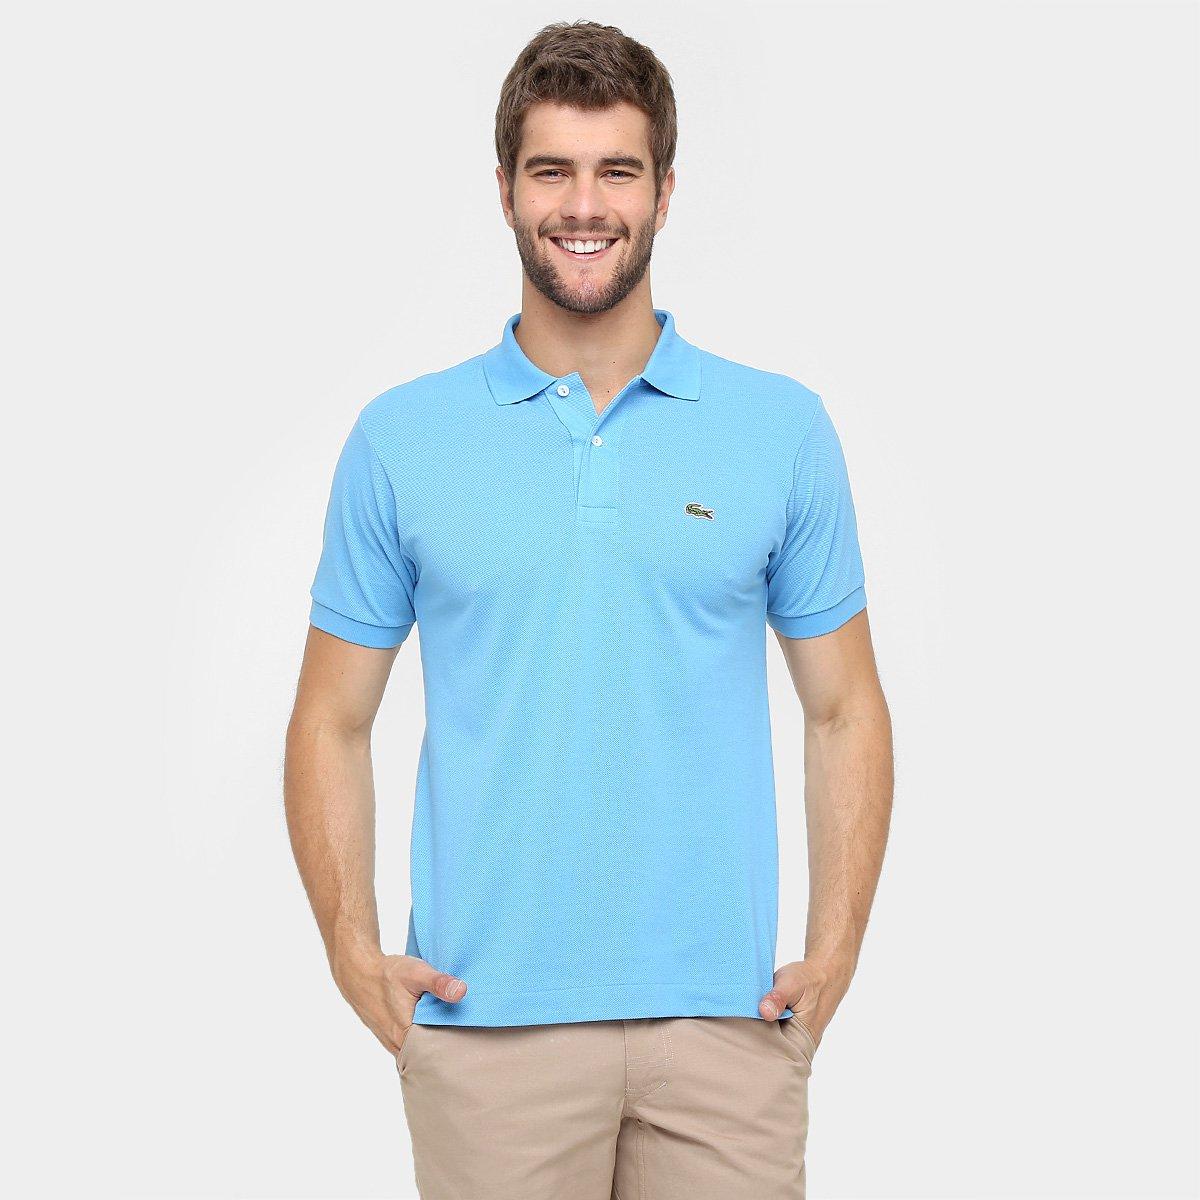 fe35d546f0d6 Camisa Polo Lacoste Piquet Original Fit Masculina - Azul Escuro   Zattini